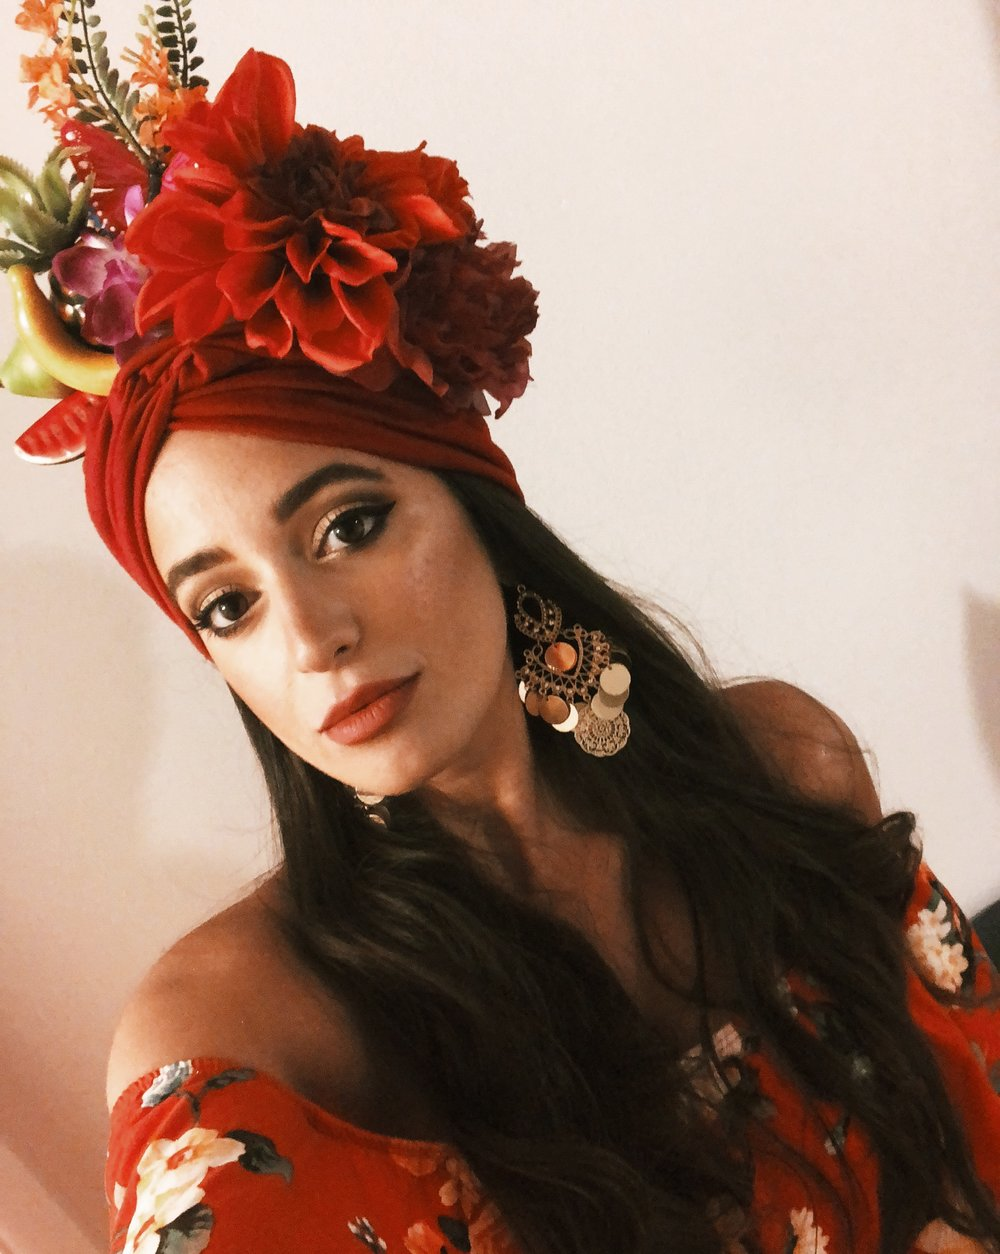 carmen-miranda-caribbean-queen-fruit-chiquita-banana-carnival-festival-tropical-halloween-makeup-mua